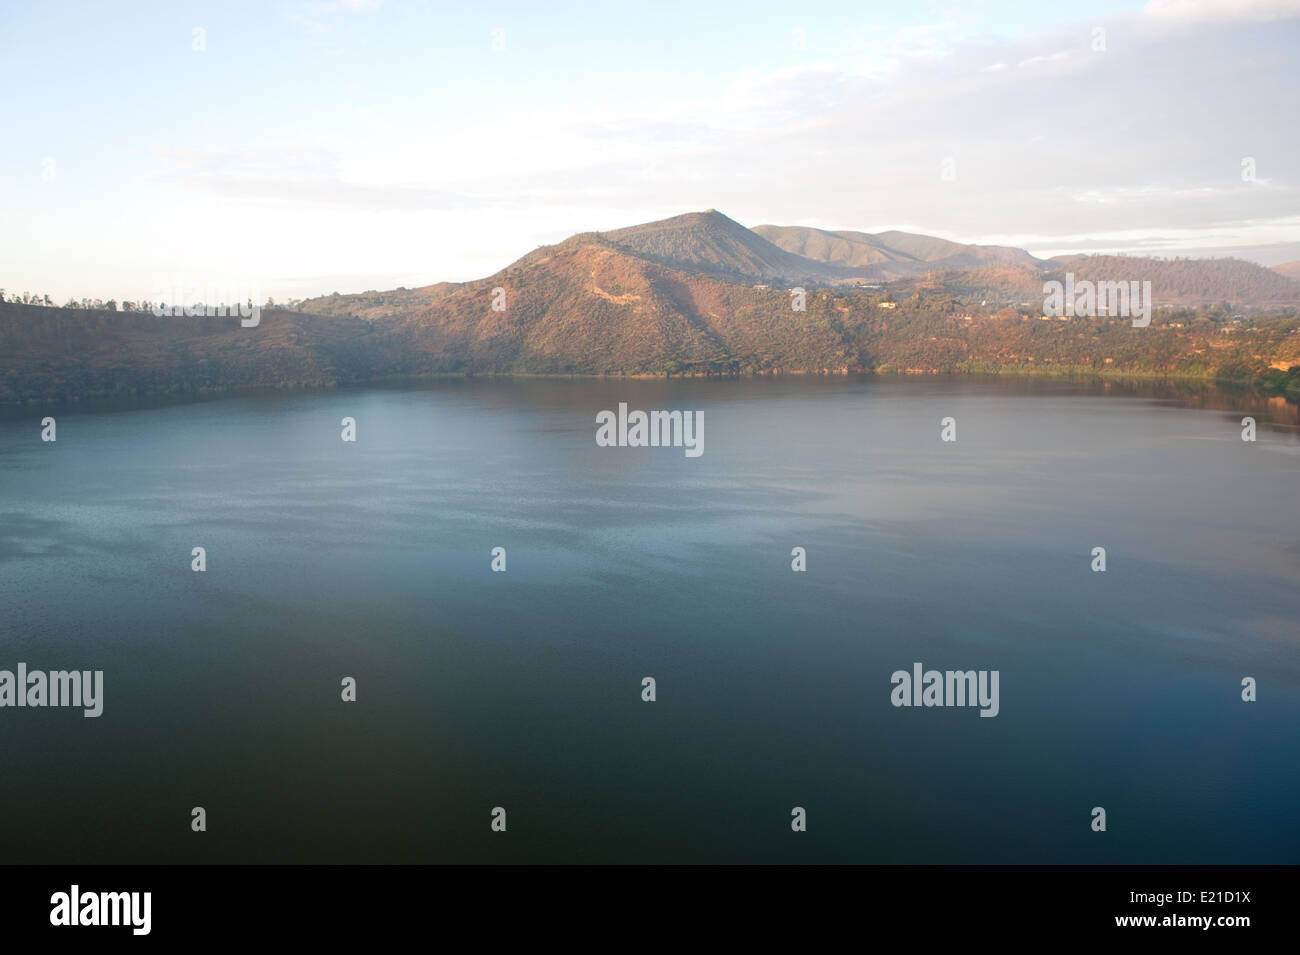 Lake Bishoftu ( Ethiopia) - Stock Image